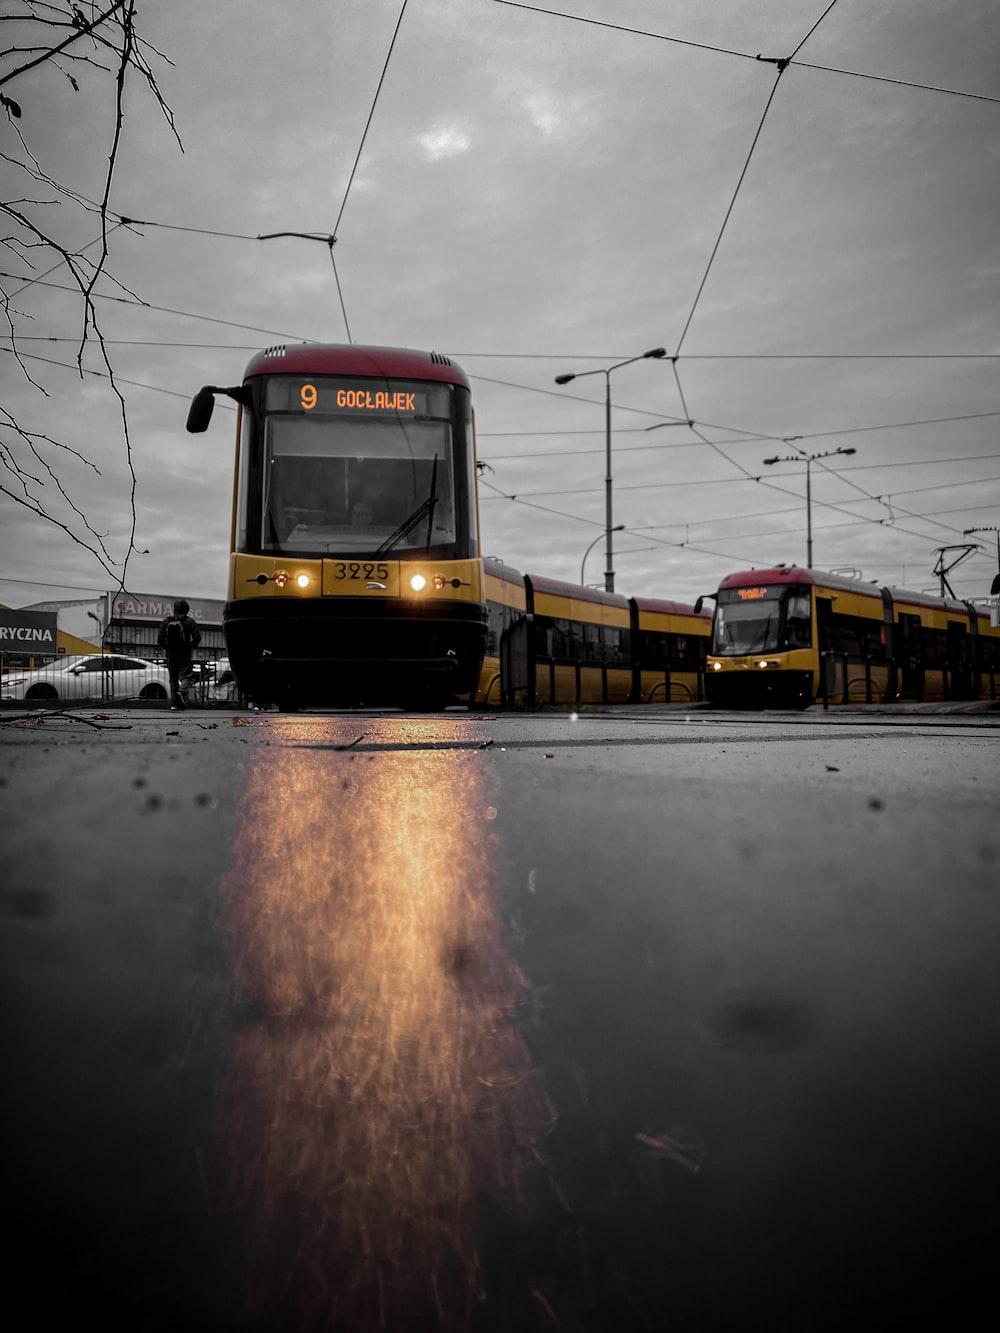 yellow and black train